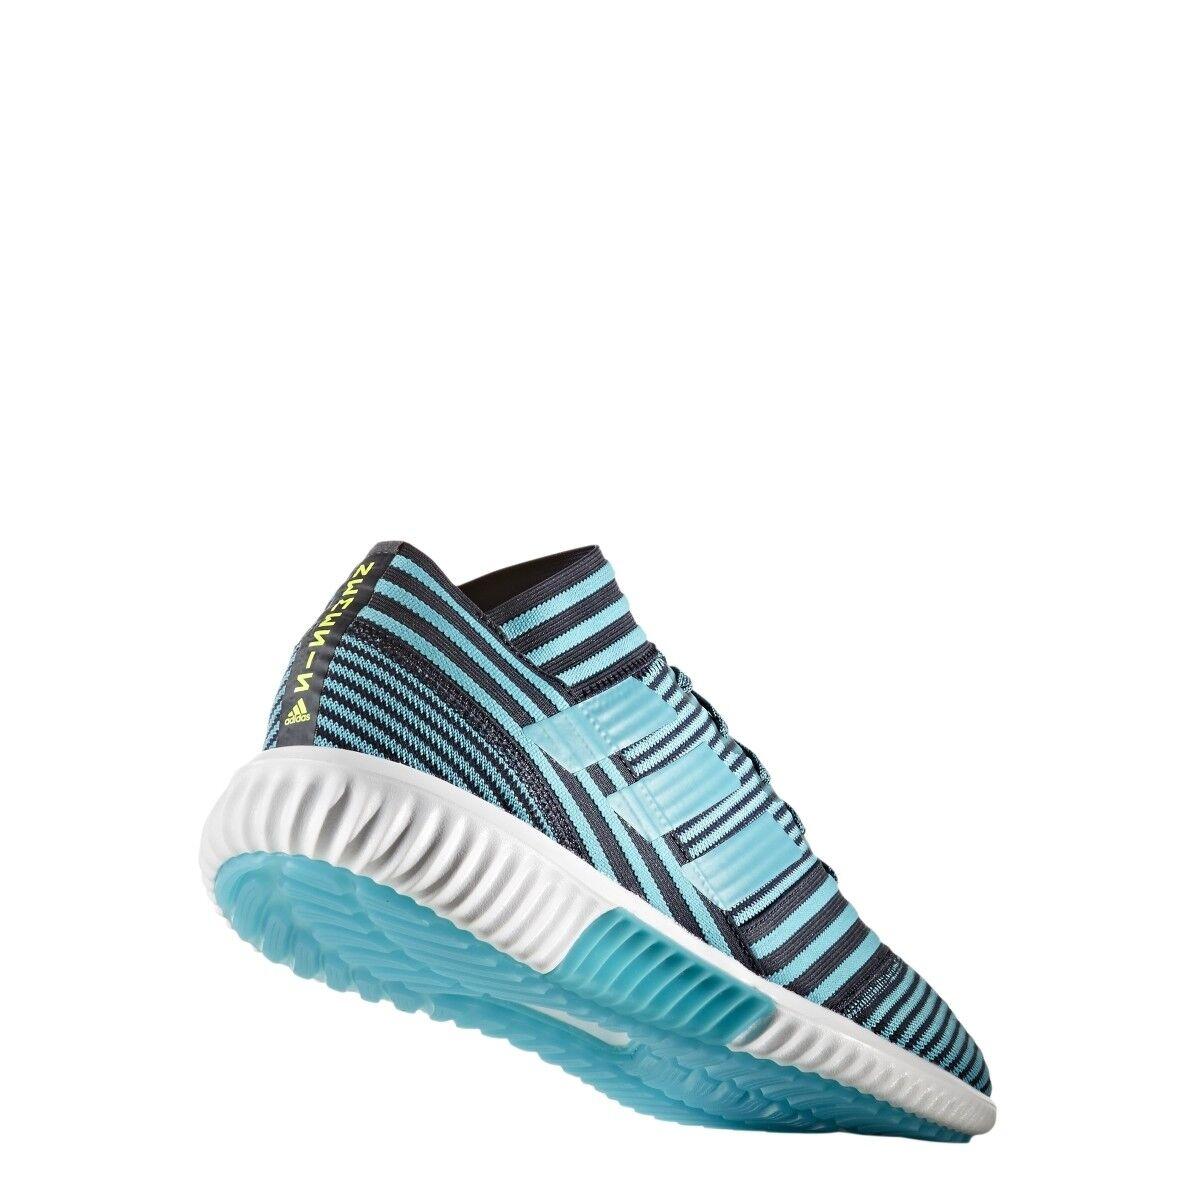 Adidas Adidas Adidas nemeziz tango - tr (modell by2306) (männer) 4cf558